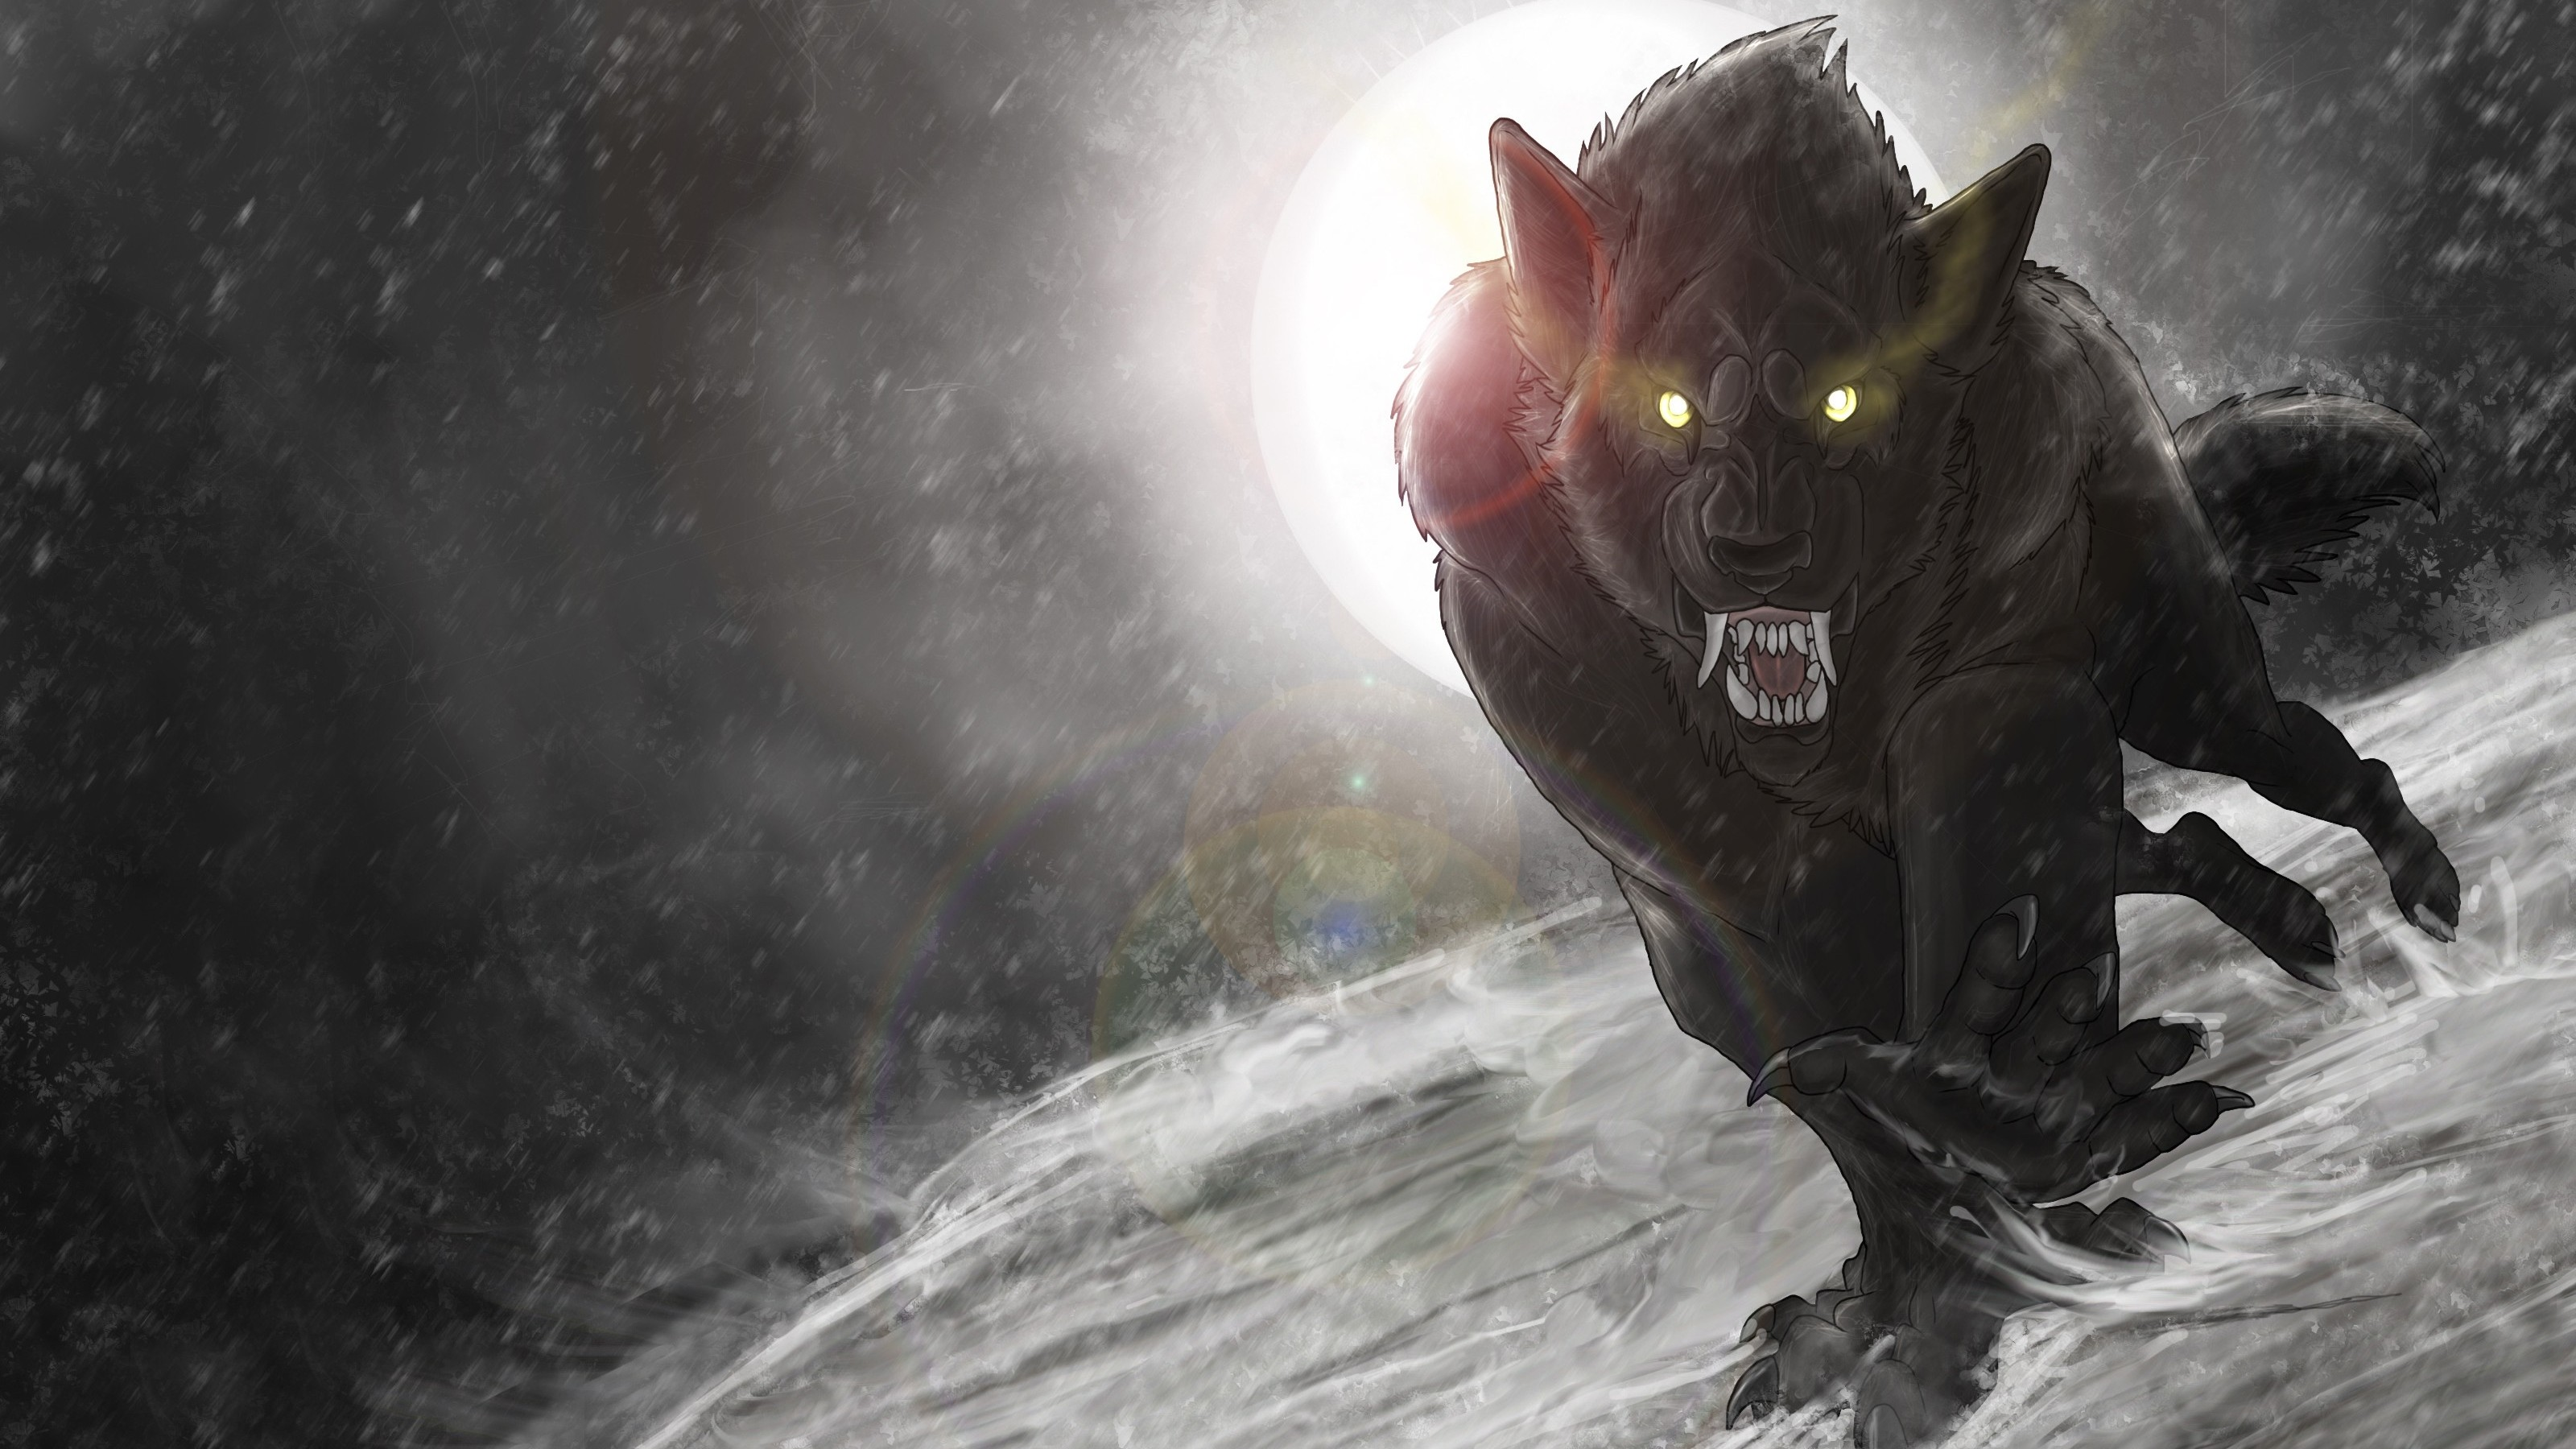 Van Helsing Werewolf Wallpapers   HD Wallpapers   Pinterest   Werewolves  and Wallpaper